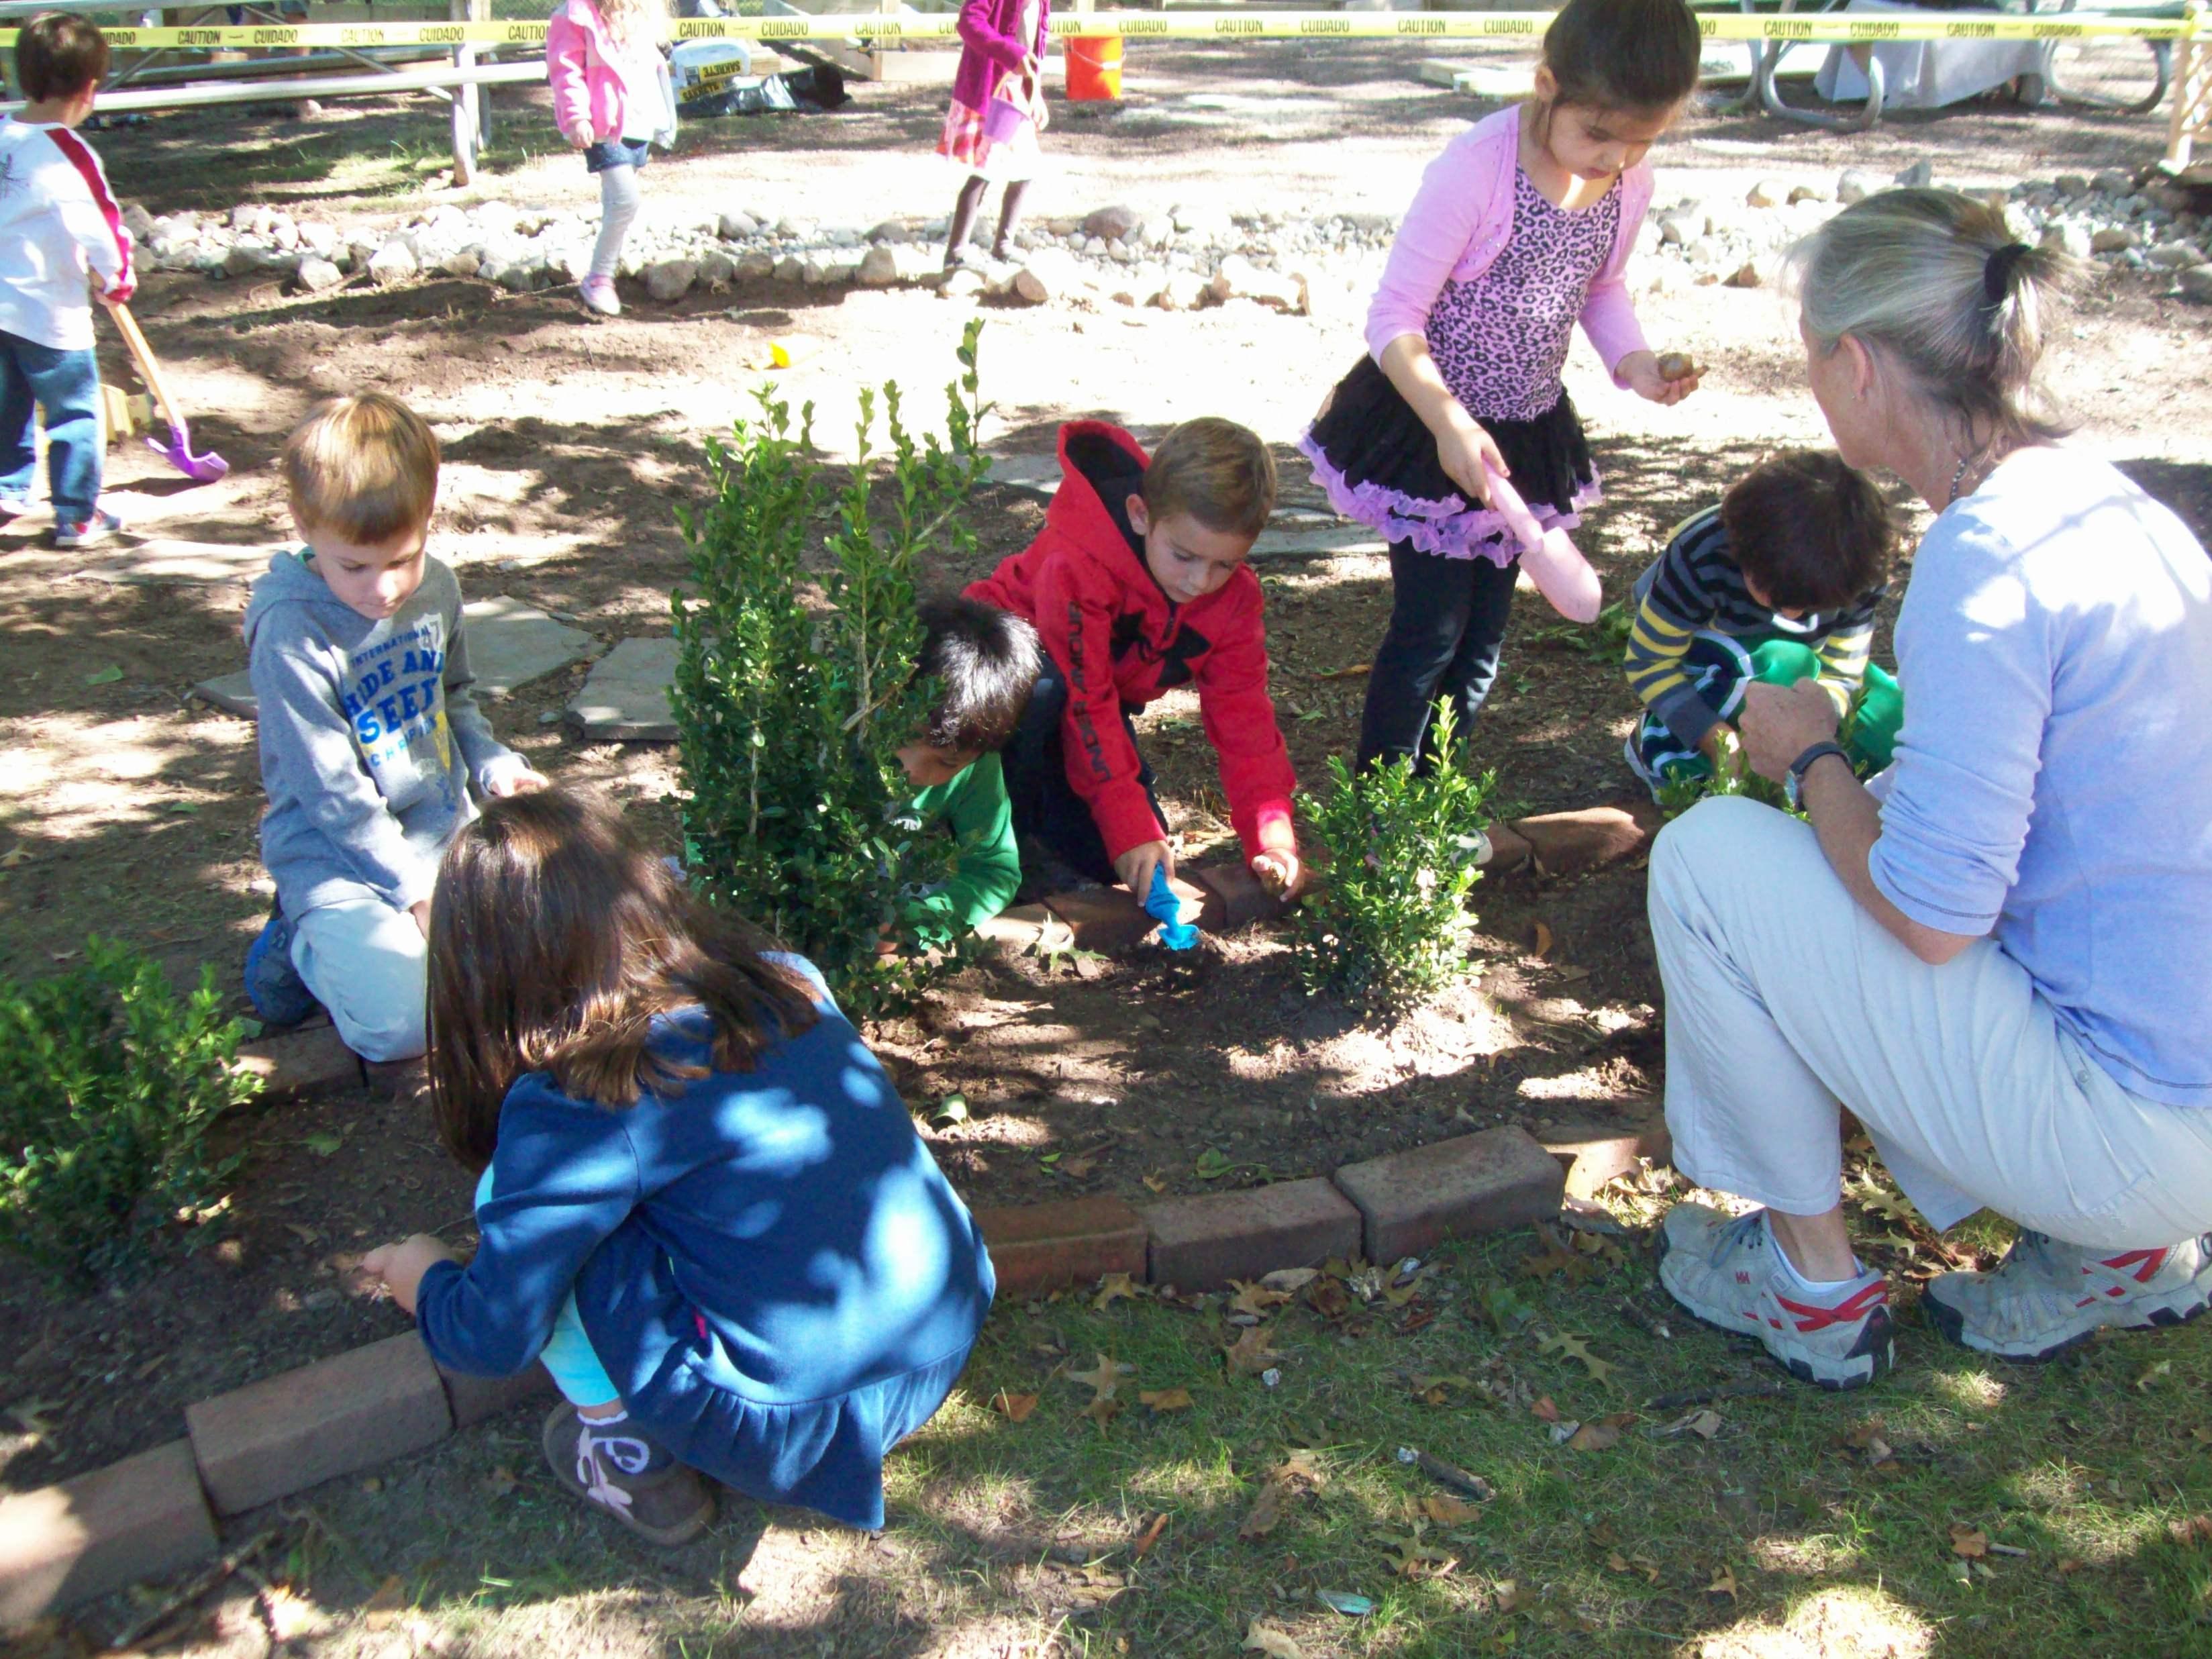 3b20c73590f53931a11c_Outdoor_Classroom_-_TSTI_Preschoolers_Planting.JPG